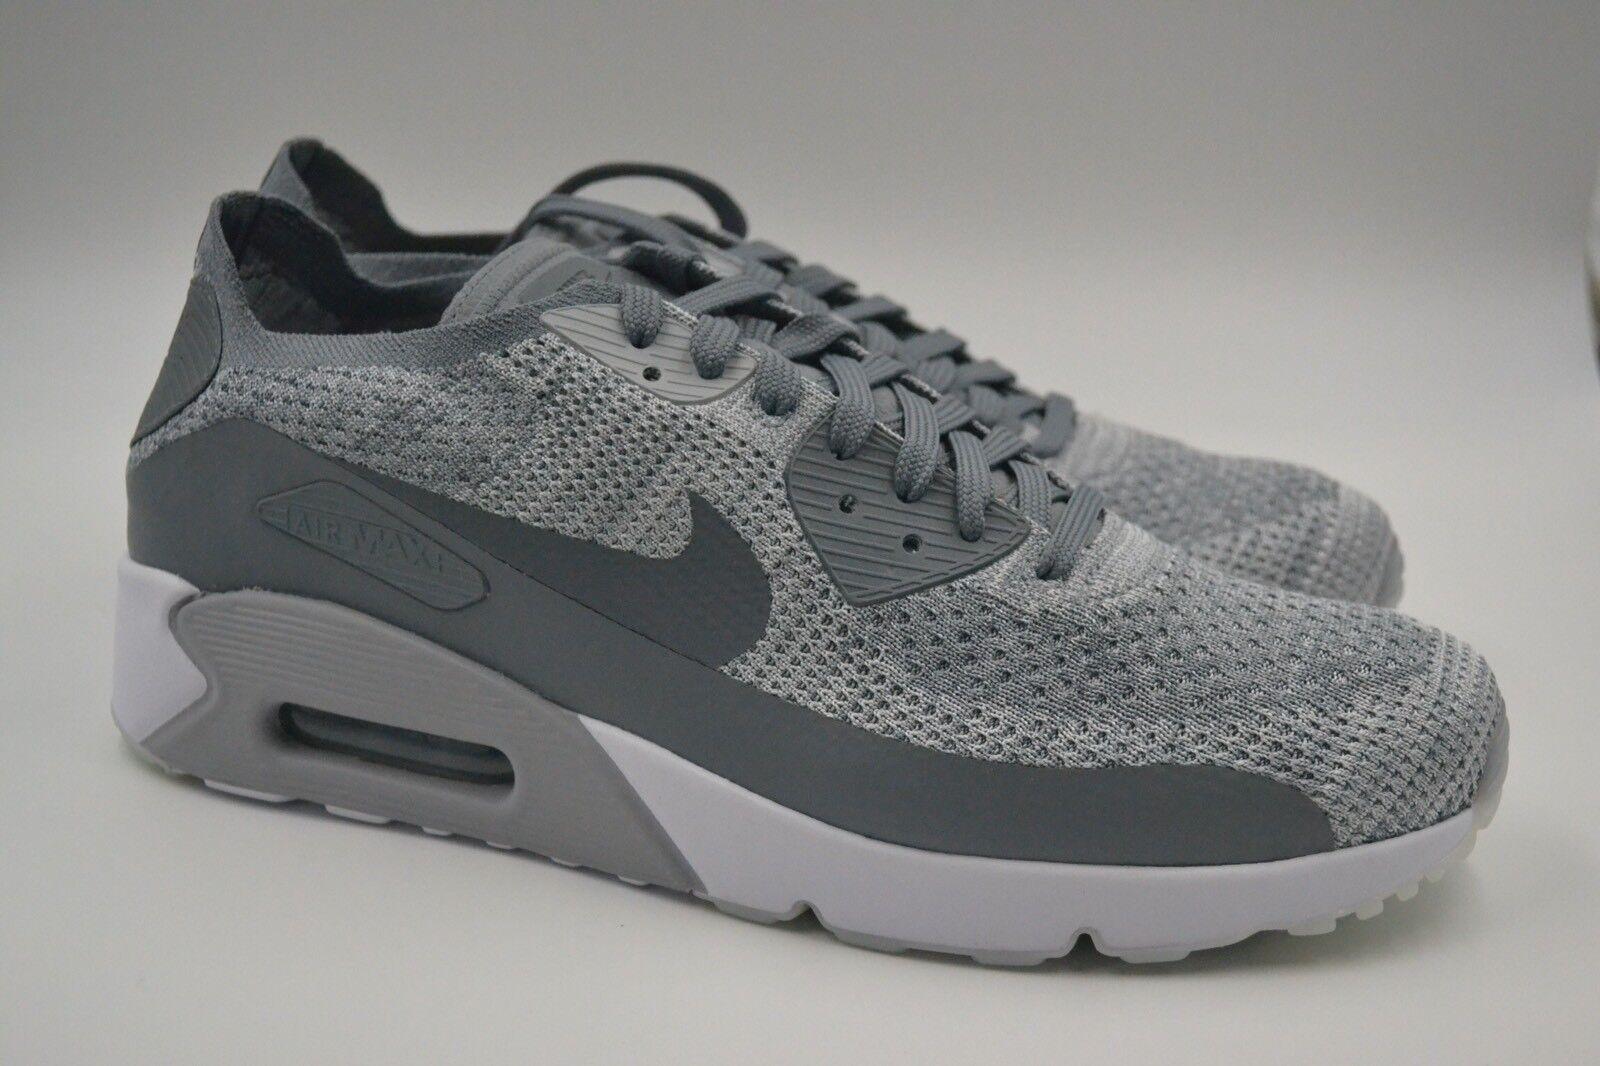 04d60b66373 Nike Air Max 90 Ultra 2.0 Flyknit Cool Grey Platinum Mens Running ...